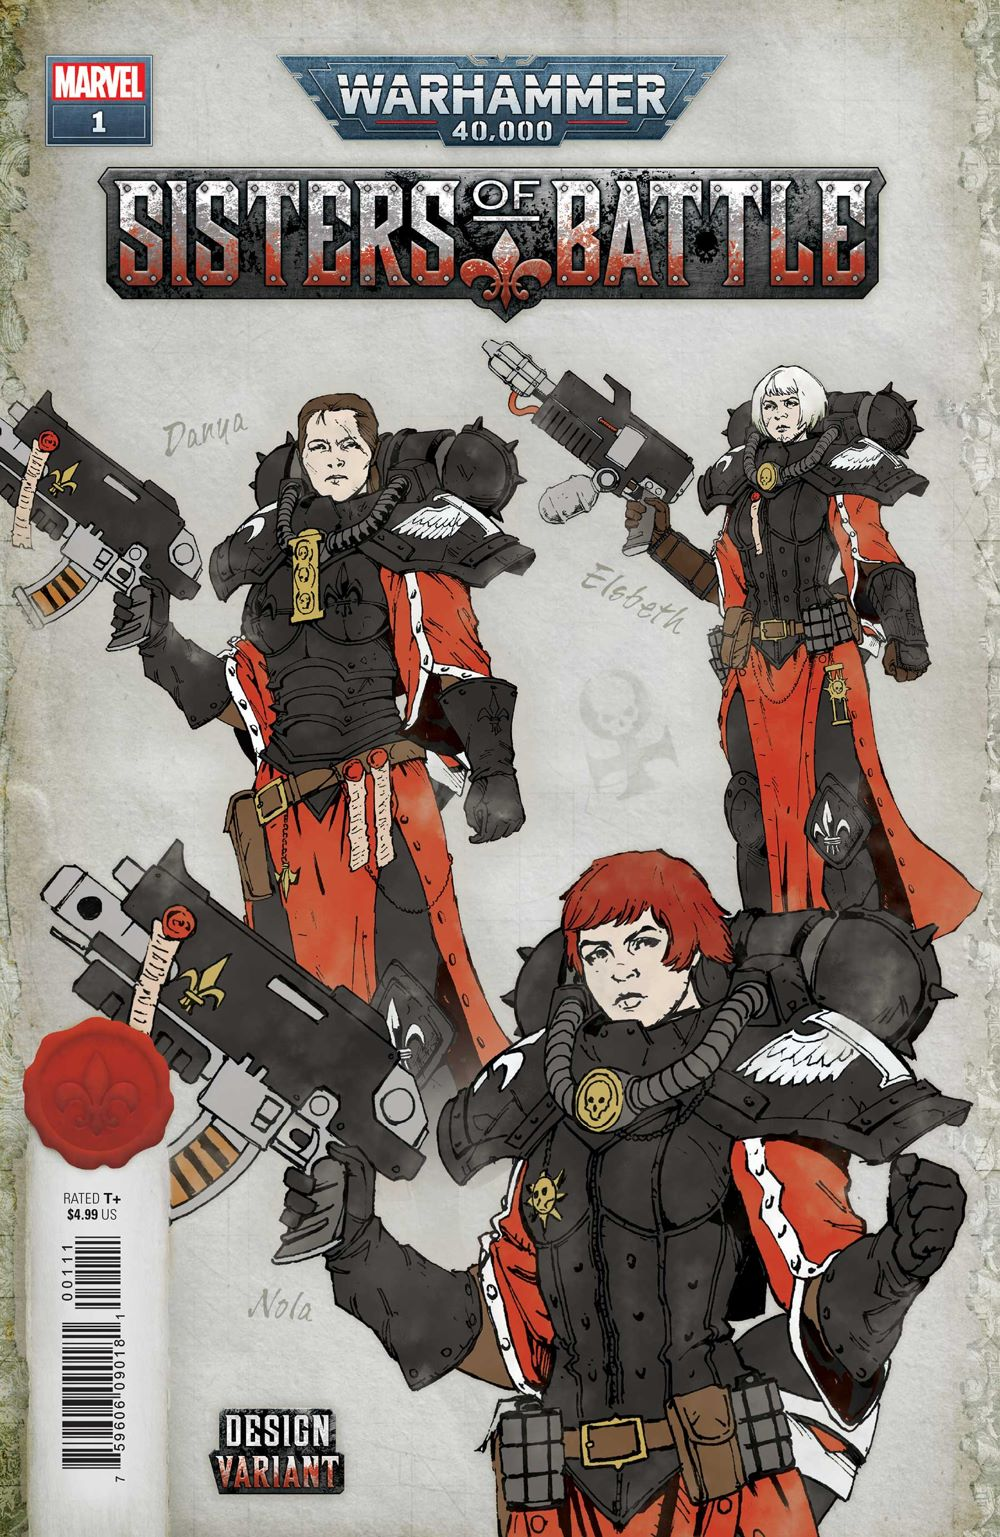 WARHAMMERSOB2021001_design_var Marvel Comics August 2021 Solicitations